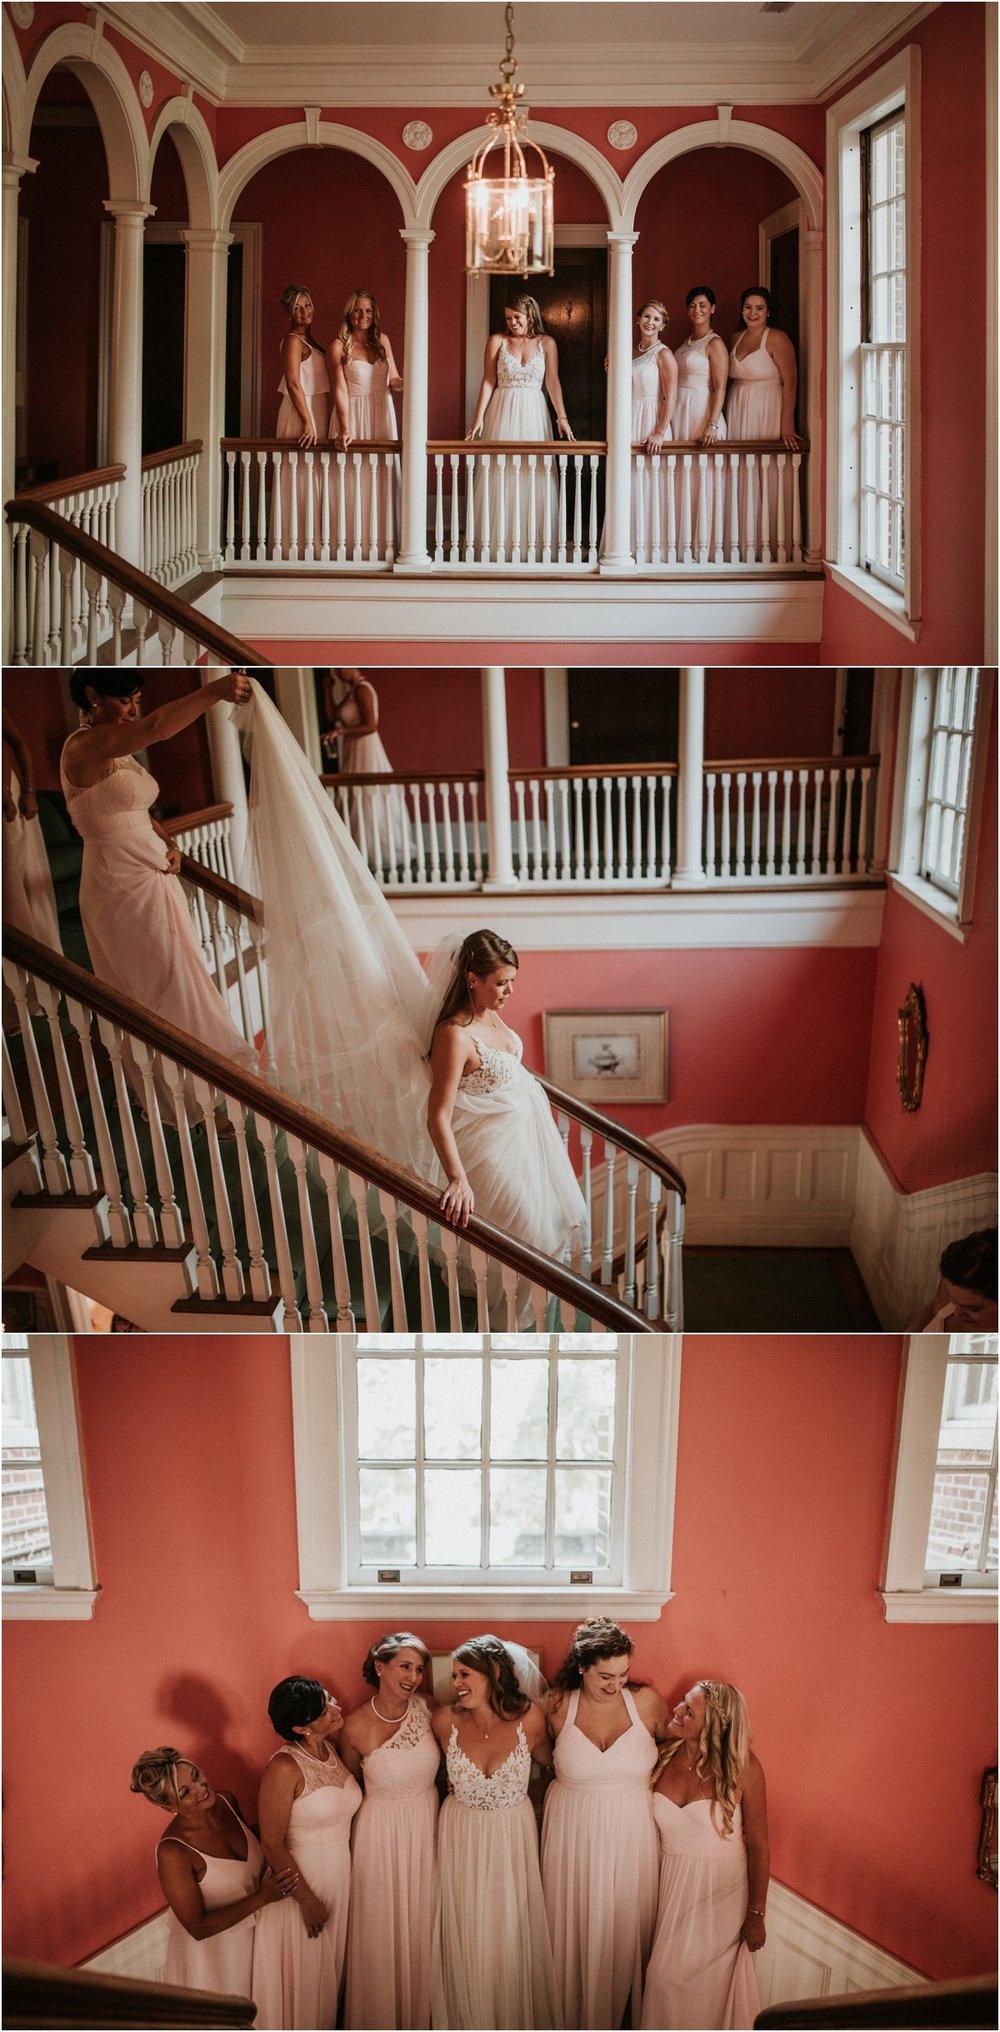 Stowe-manor-wedding-belmont-nc_0023.jpg